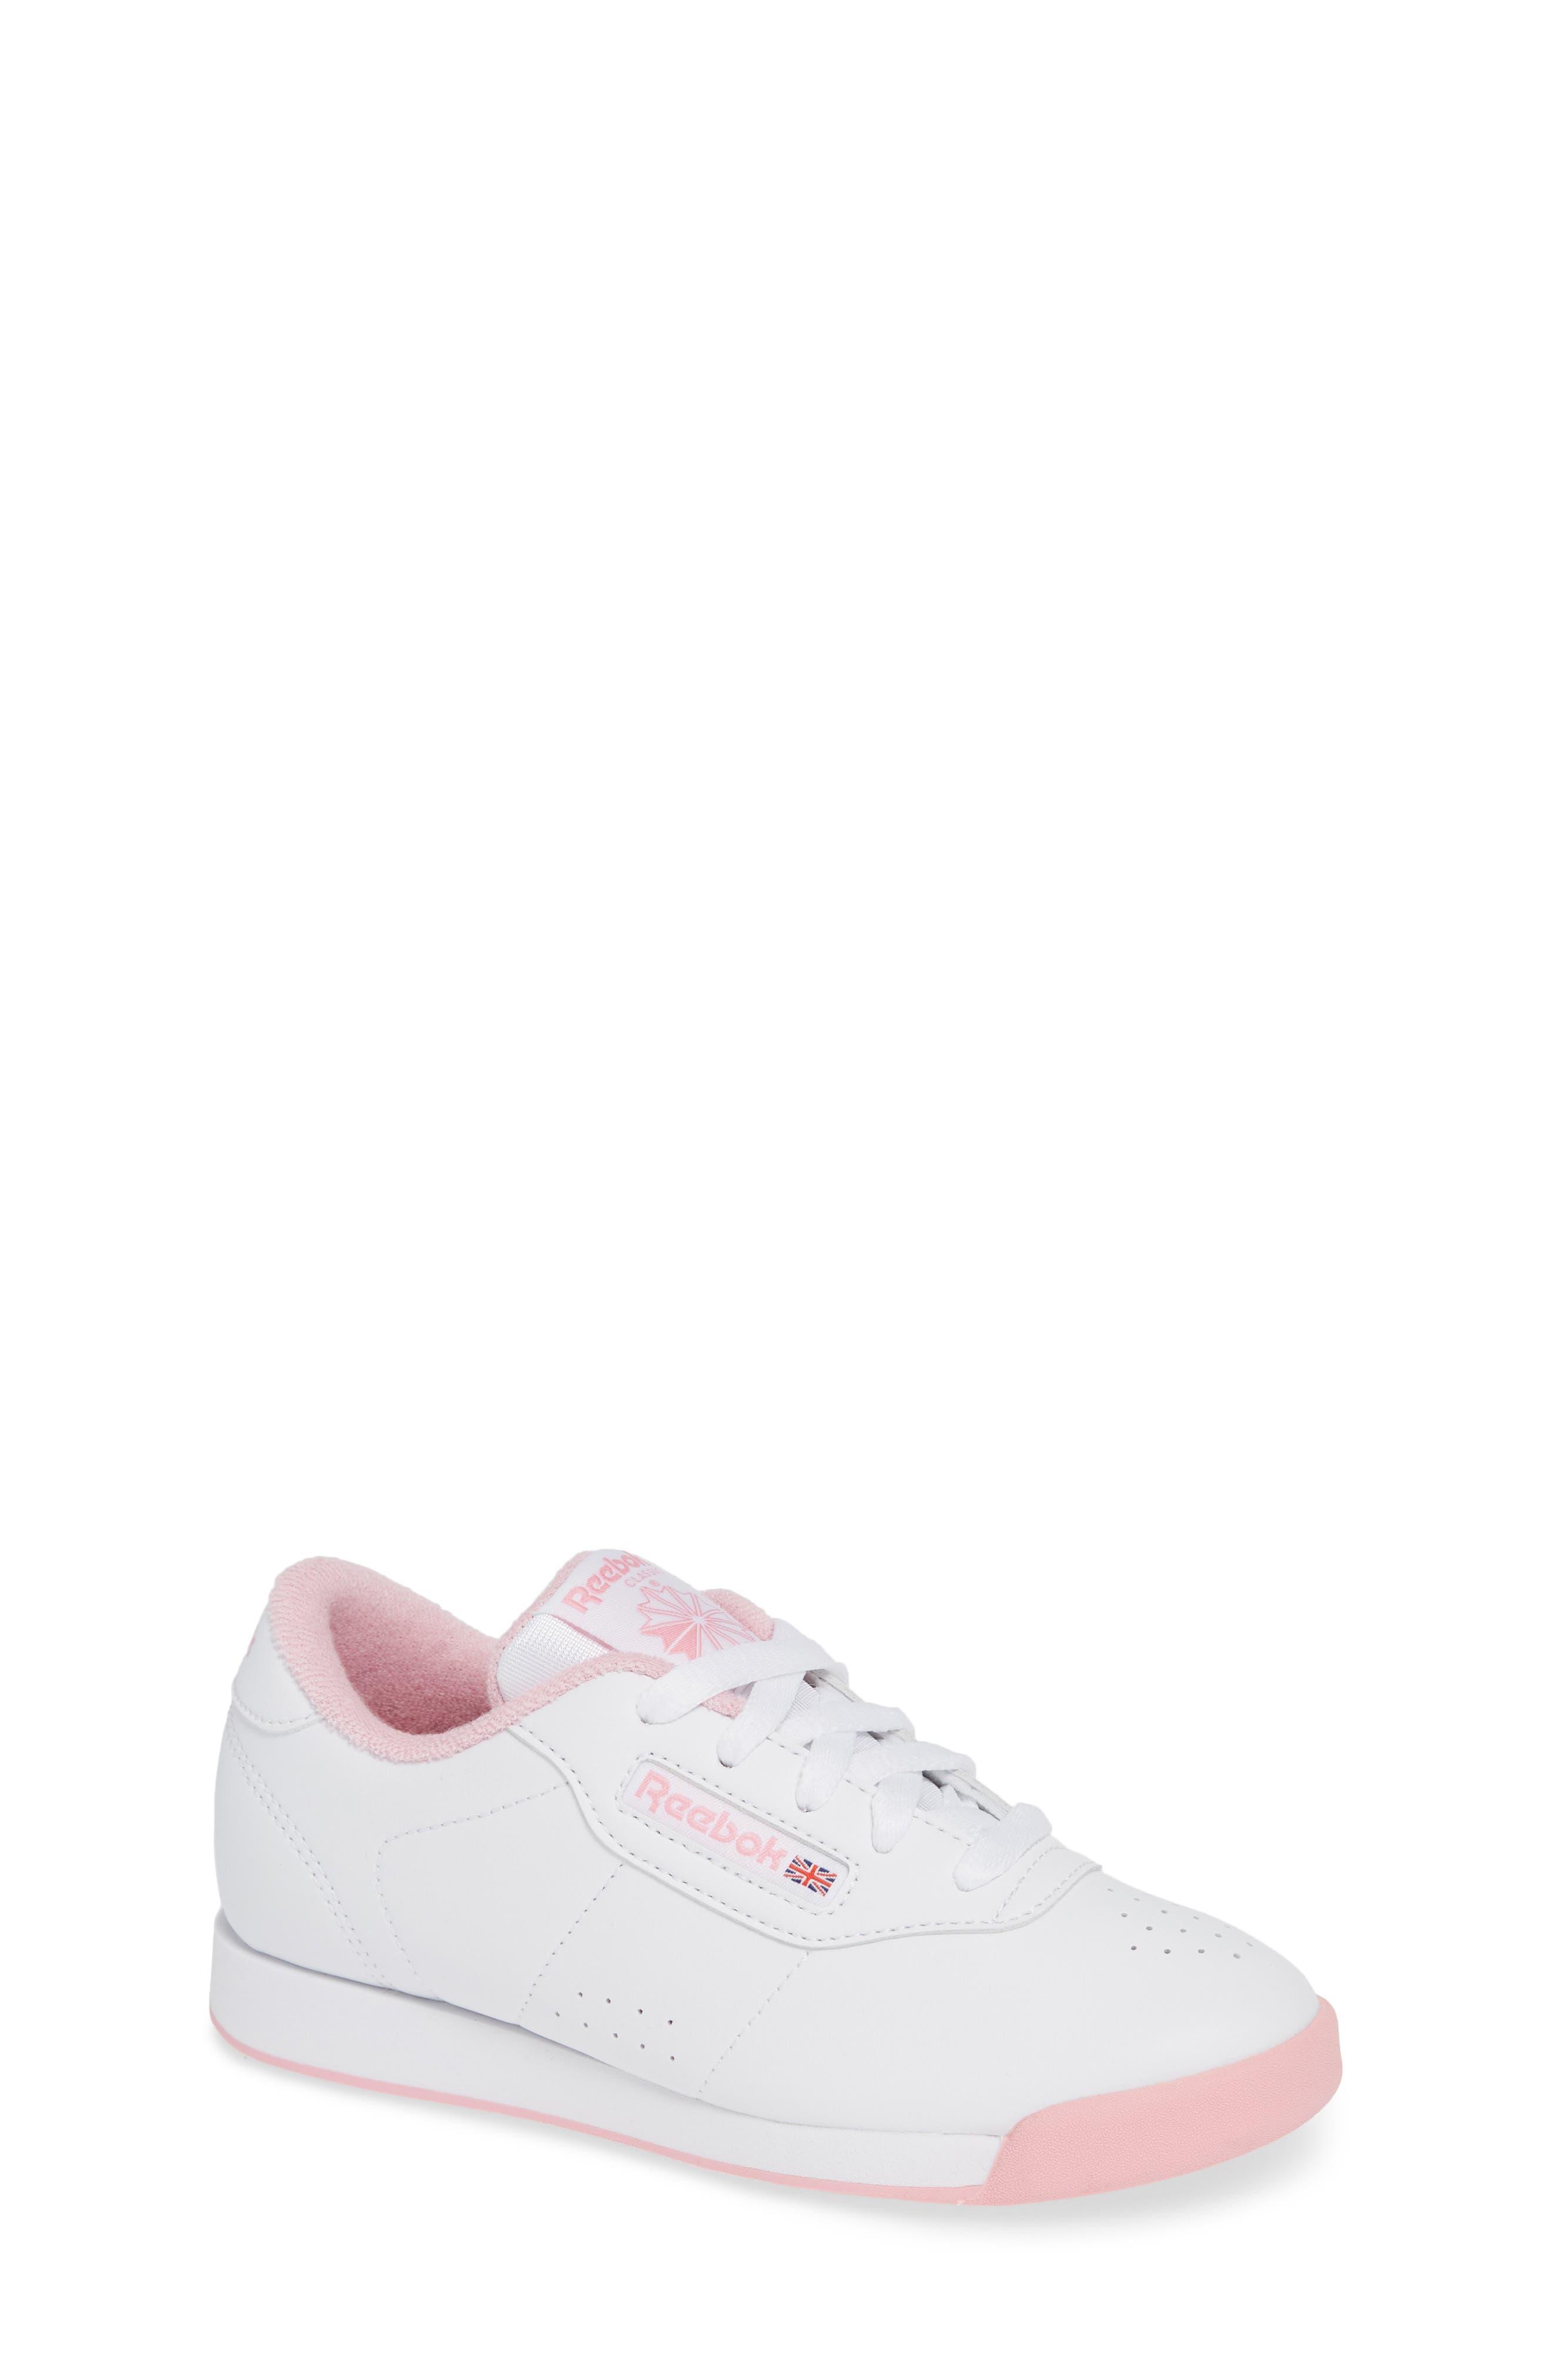 REEBOK,                             Princess Sneaker,                             Main thumbnail 1, color,                             100